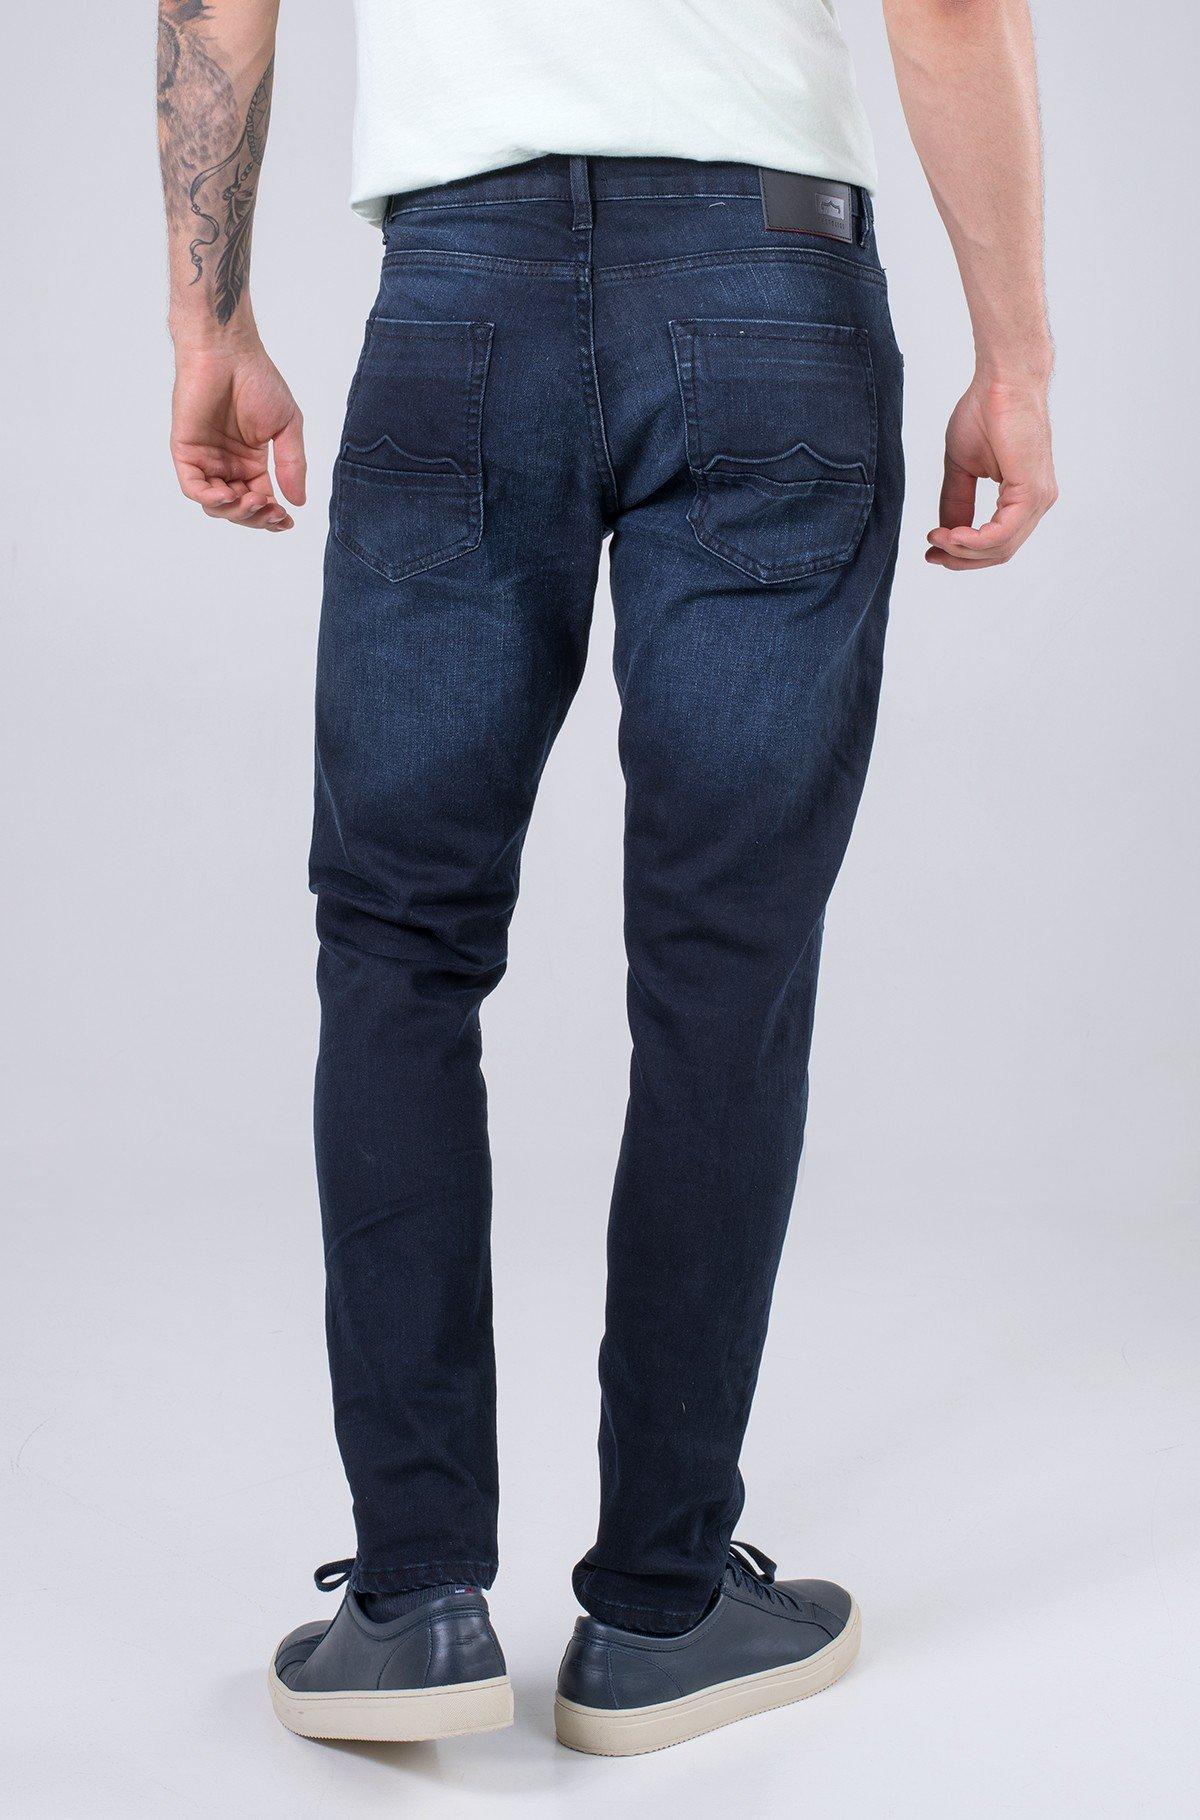 Jeans MORIARTY LAK 517-full-2